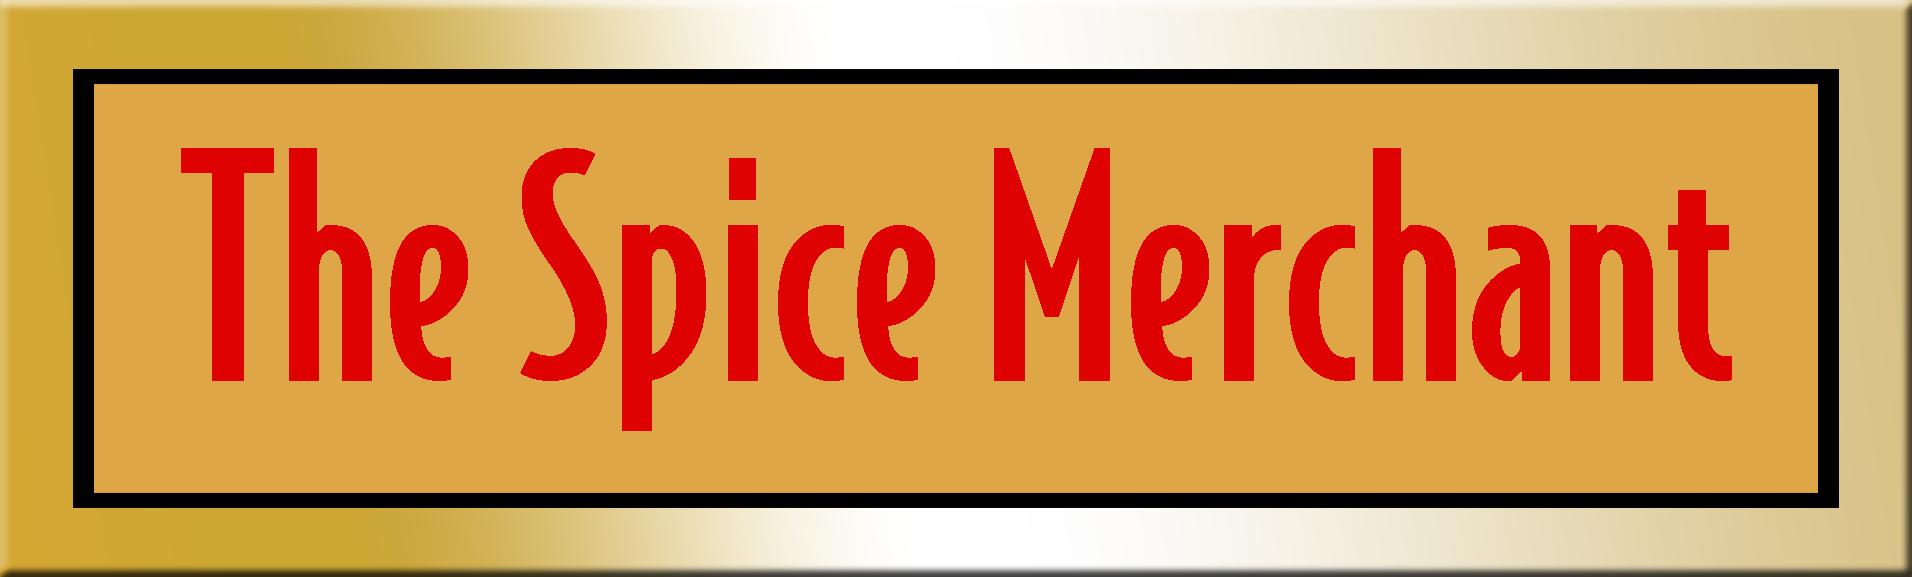 The Spice Merchant | The Spice Merchant, Quary Bank